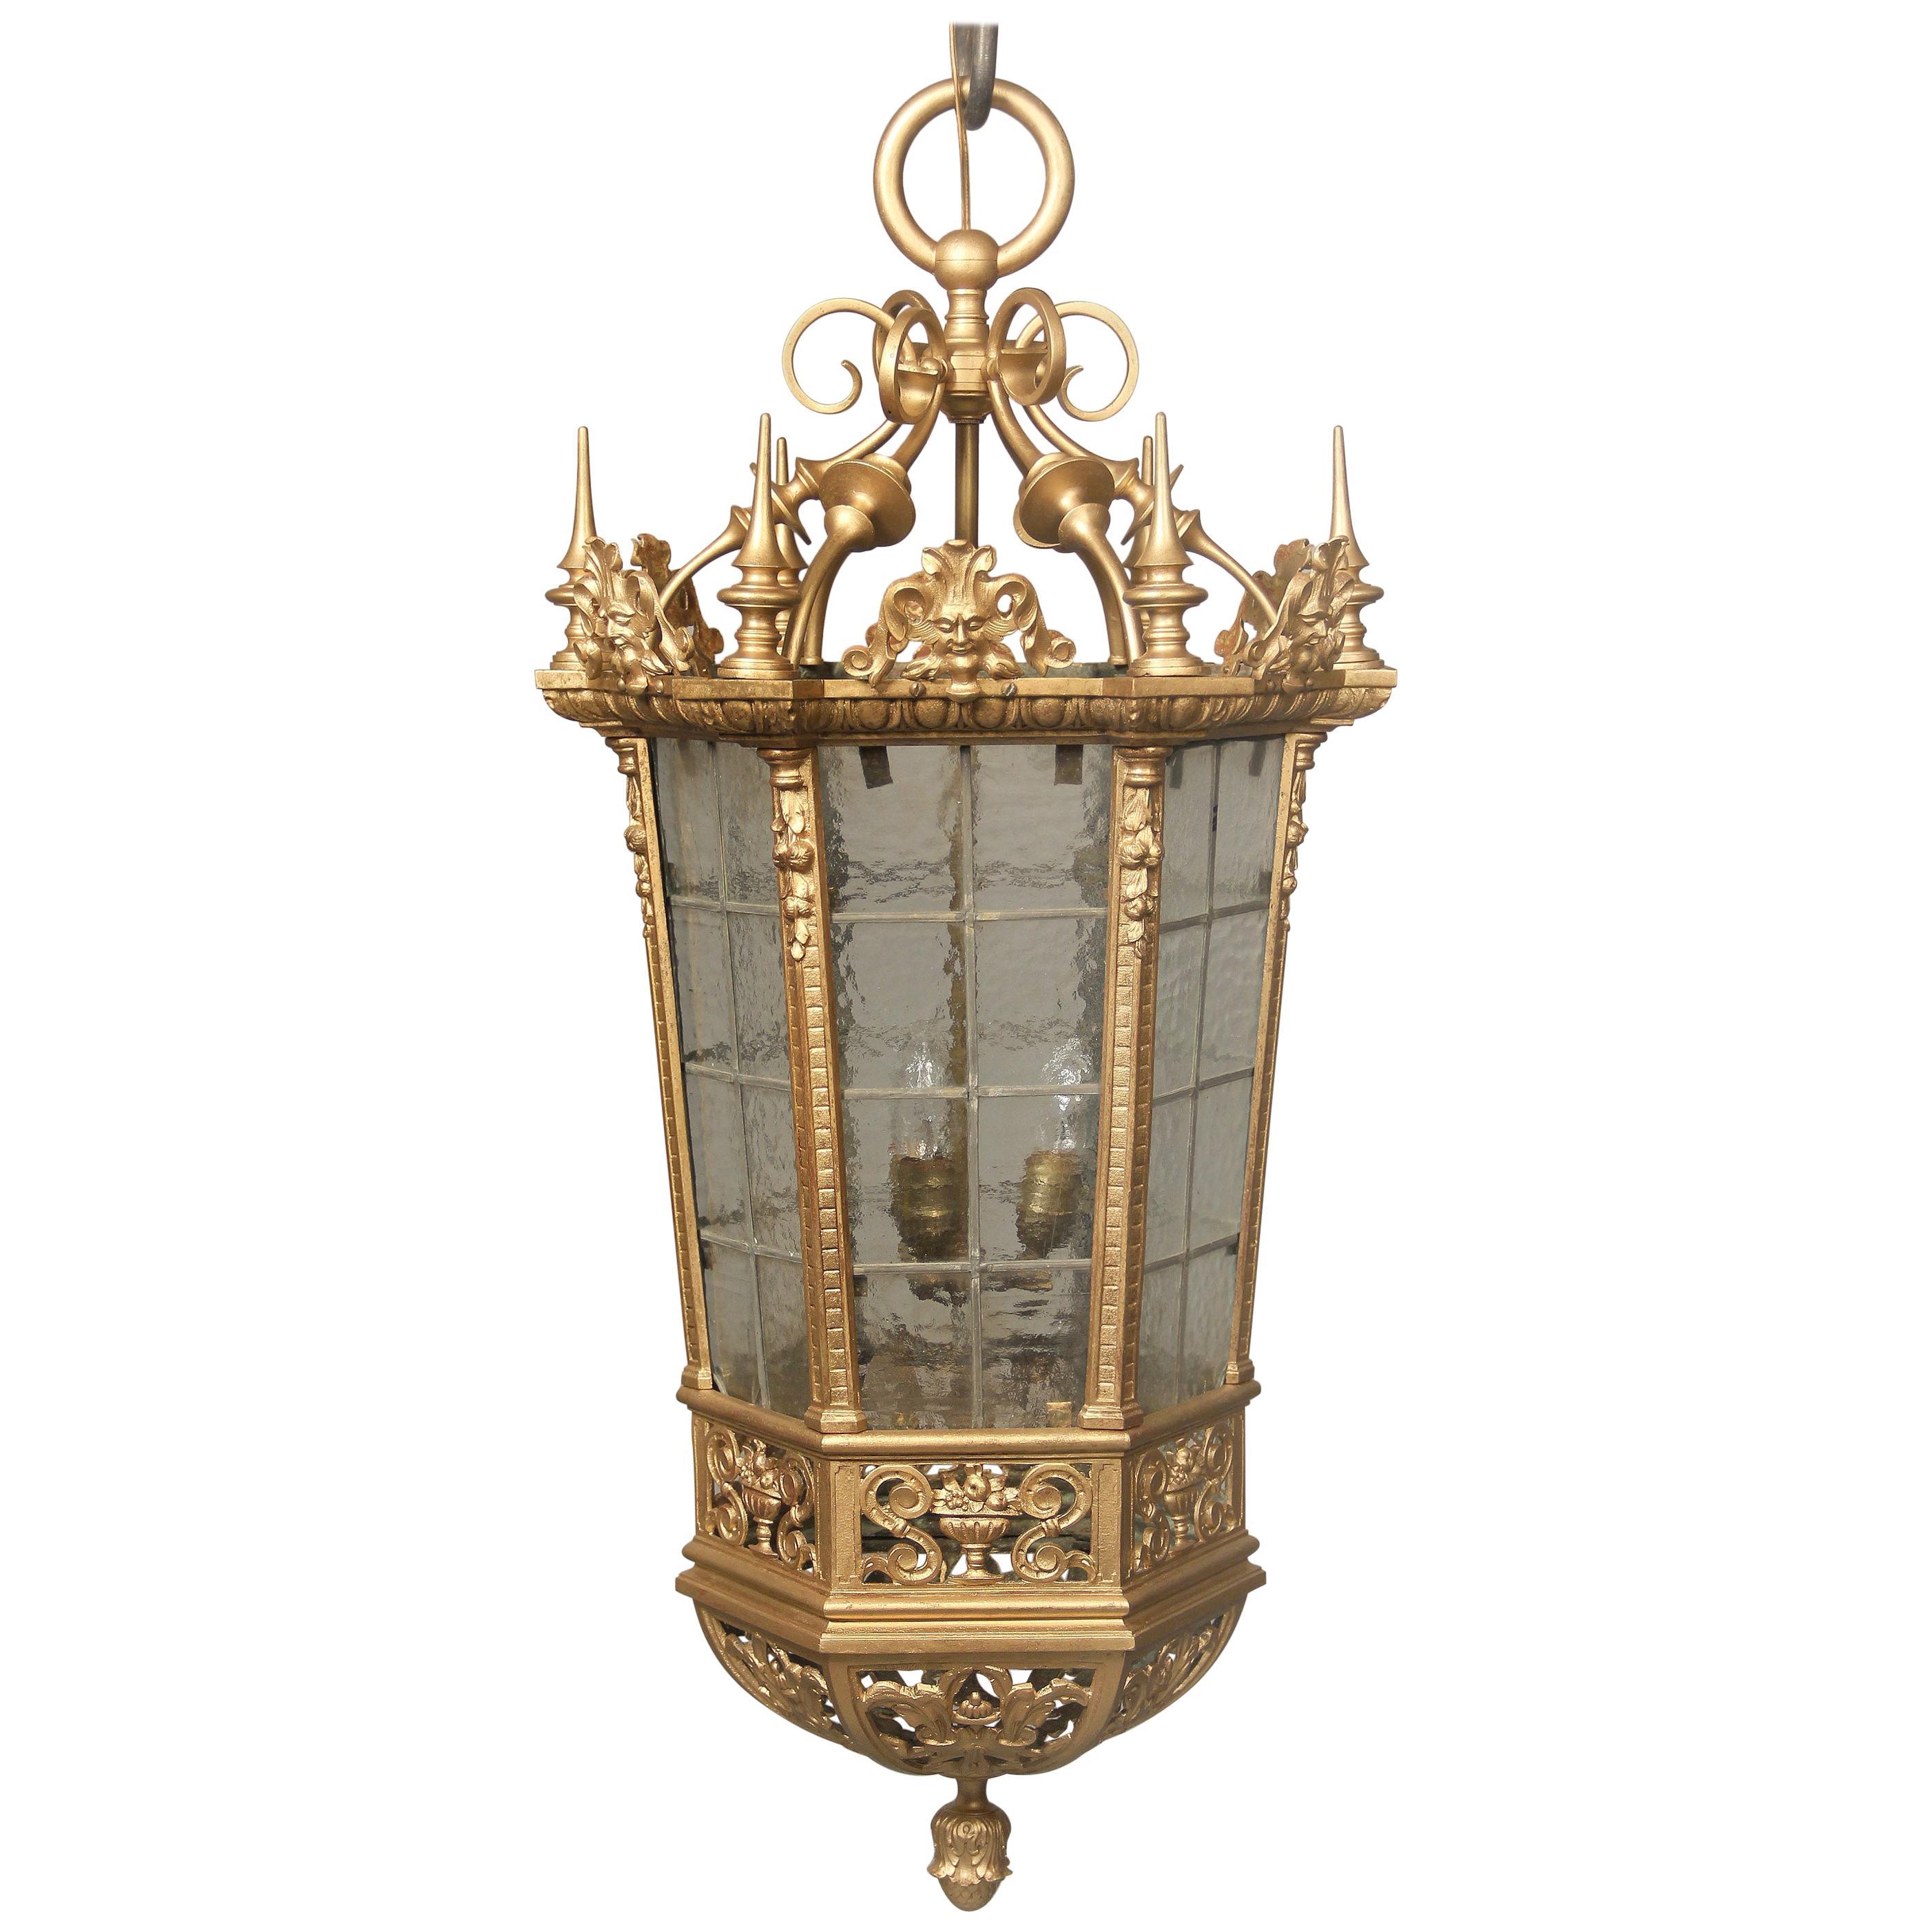 Interesting Late 19th Century Gilt Bronze and Rippled Glass Gothic Lantern